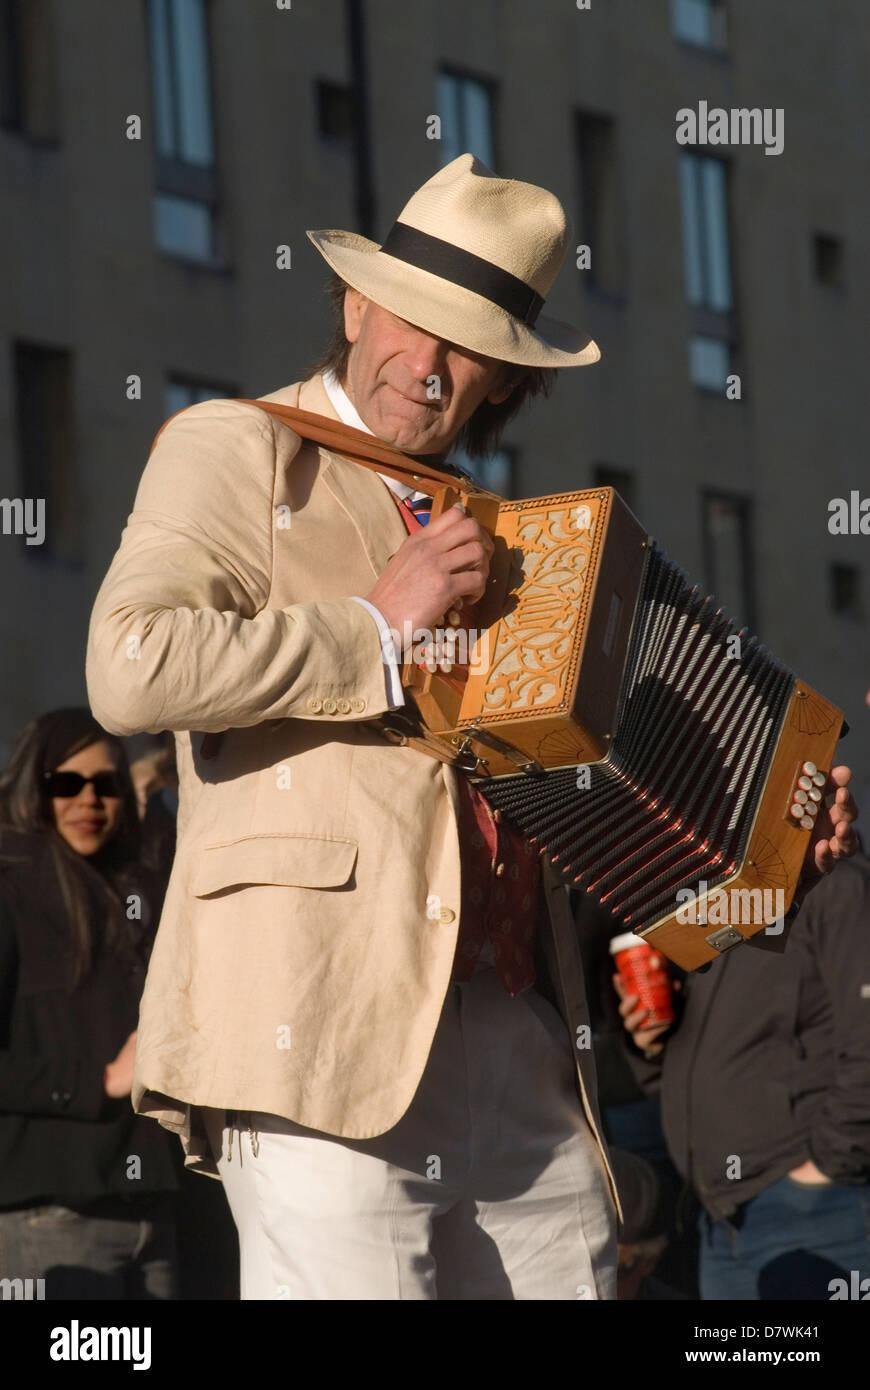 Man playing folk music accordian player Oxford, Oxfordshire May Morning. - Stock Image